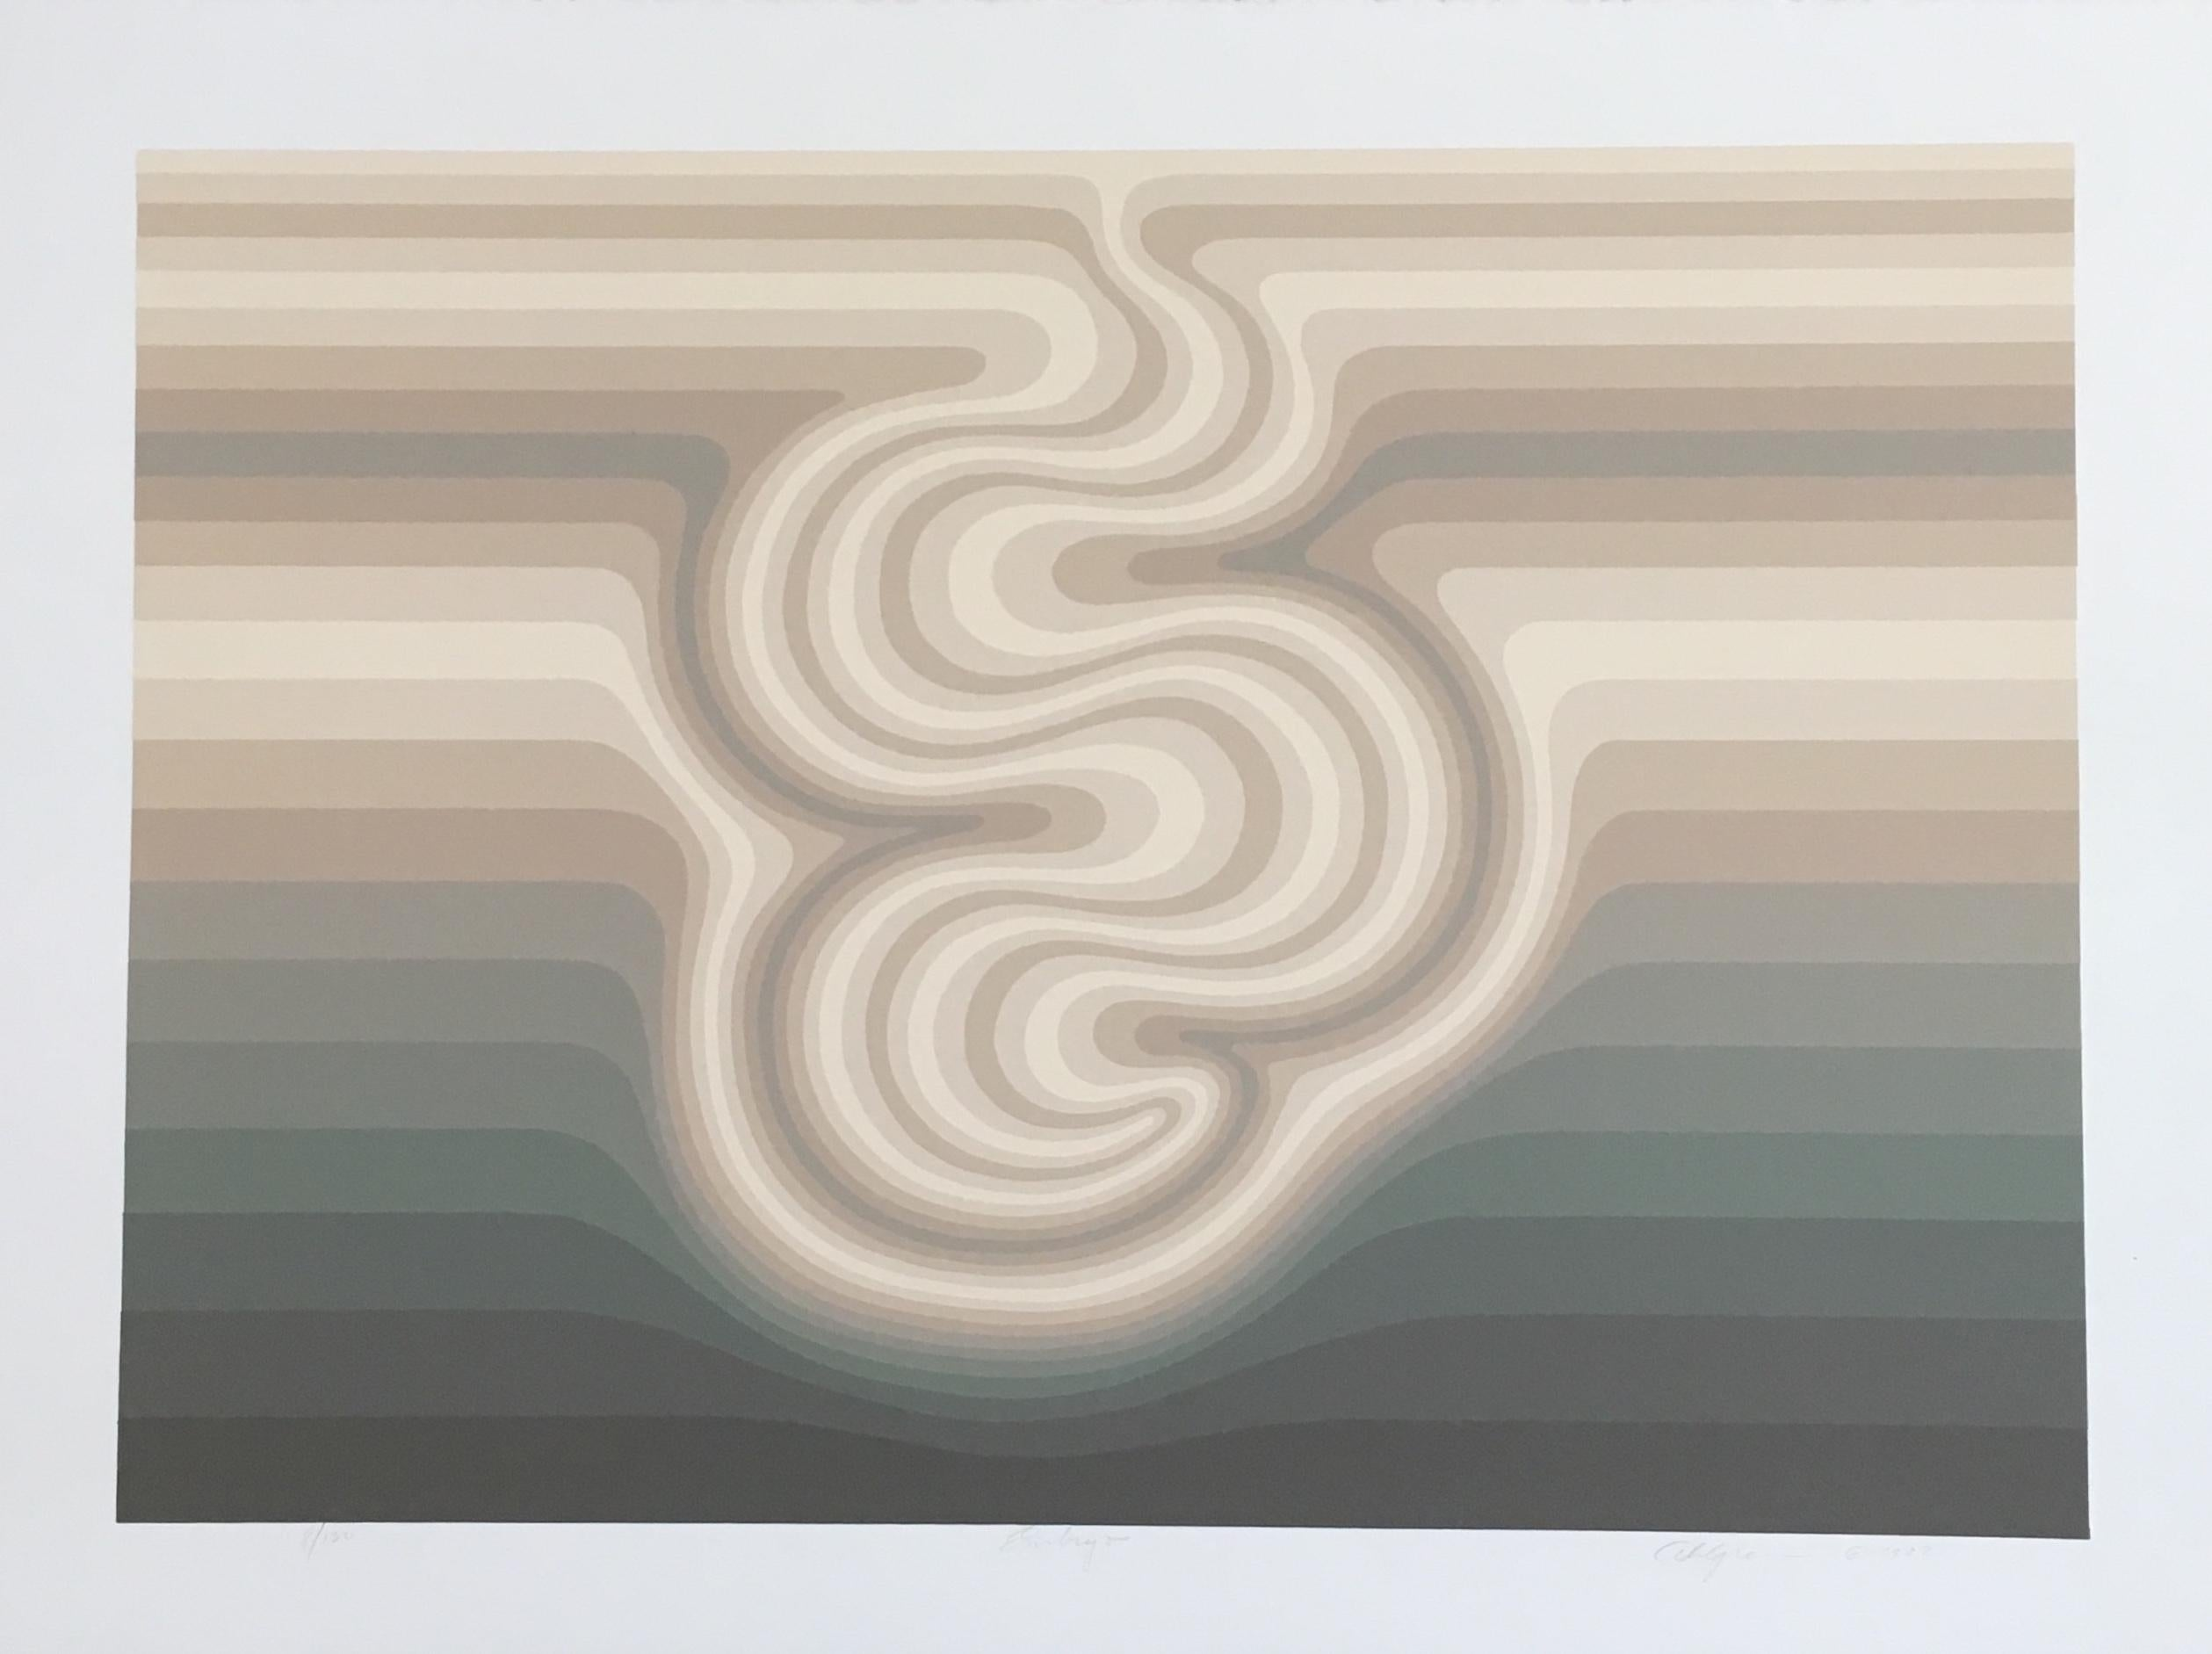 Roy Ahlgren 'Embryo' Signed Limited Edition Op-Art Serigraph Print